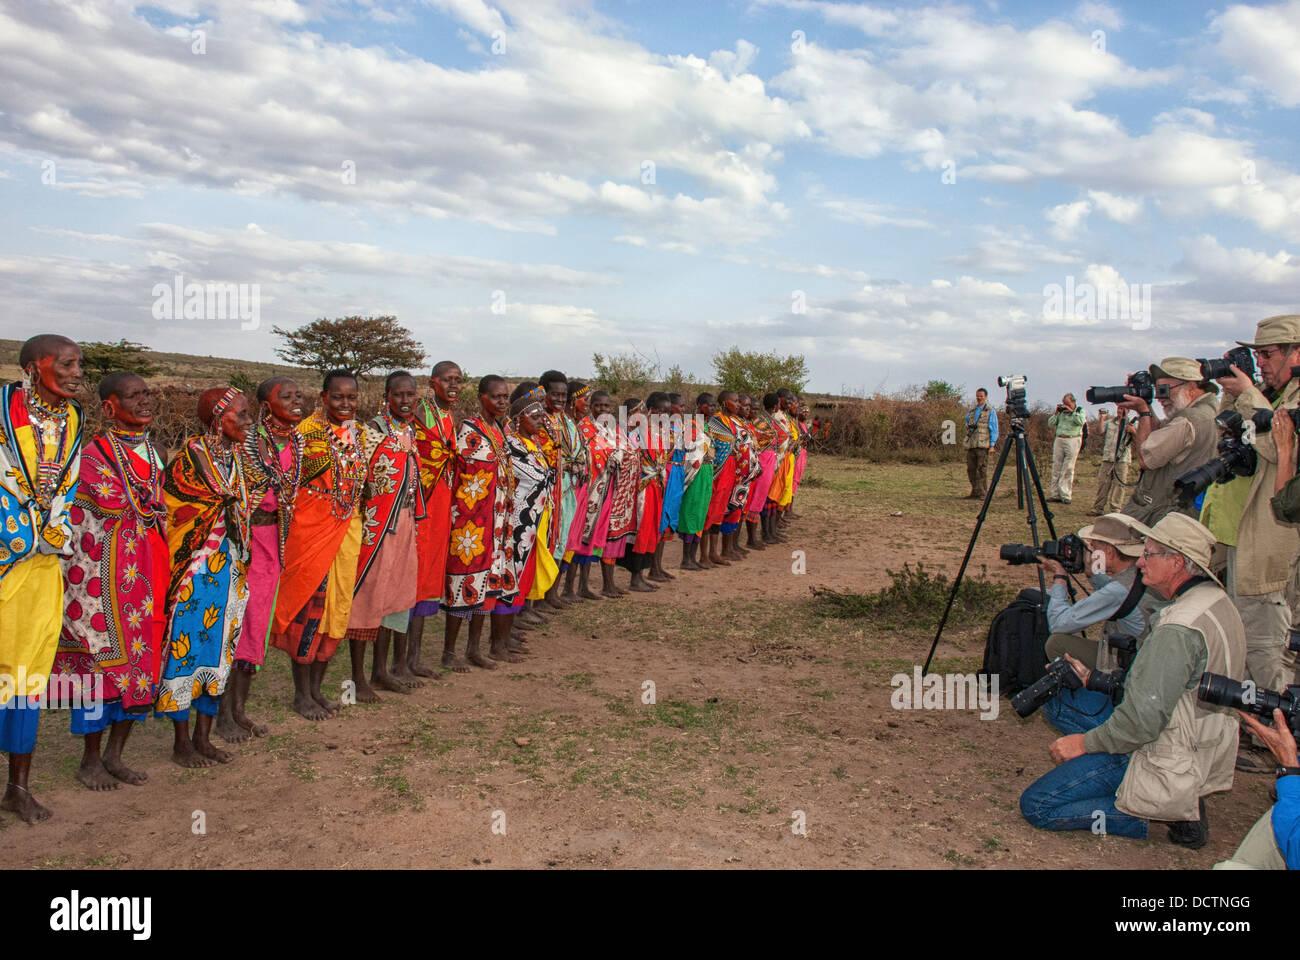 Tourist photographers taking photos of a line of Maasai women doing a welcome dance, village in Masai Mara, Kenya, - Stock Image